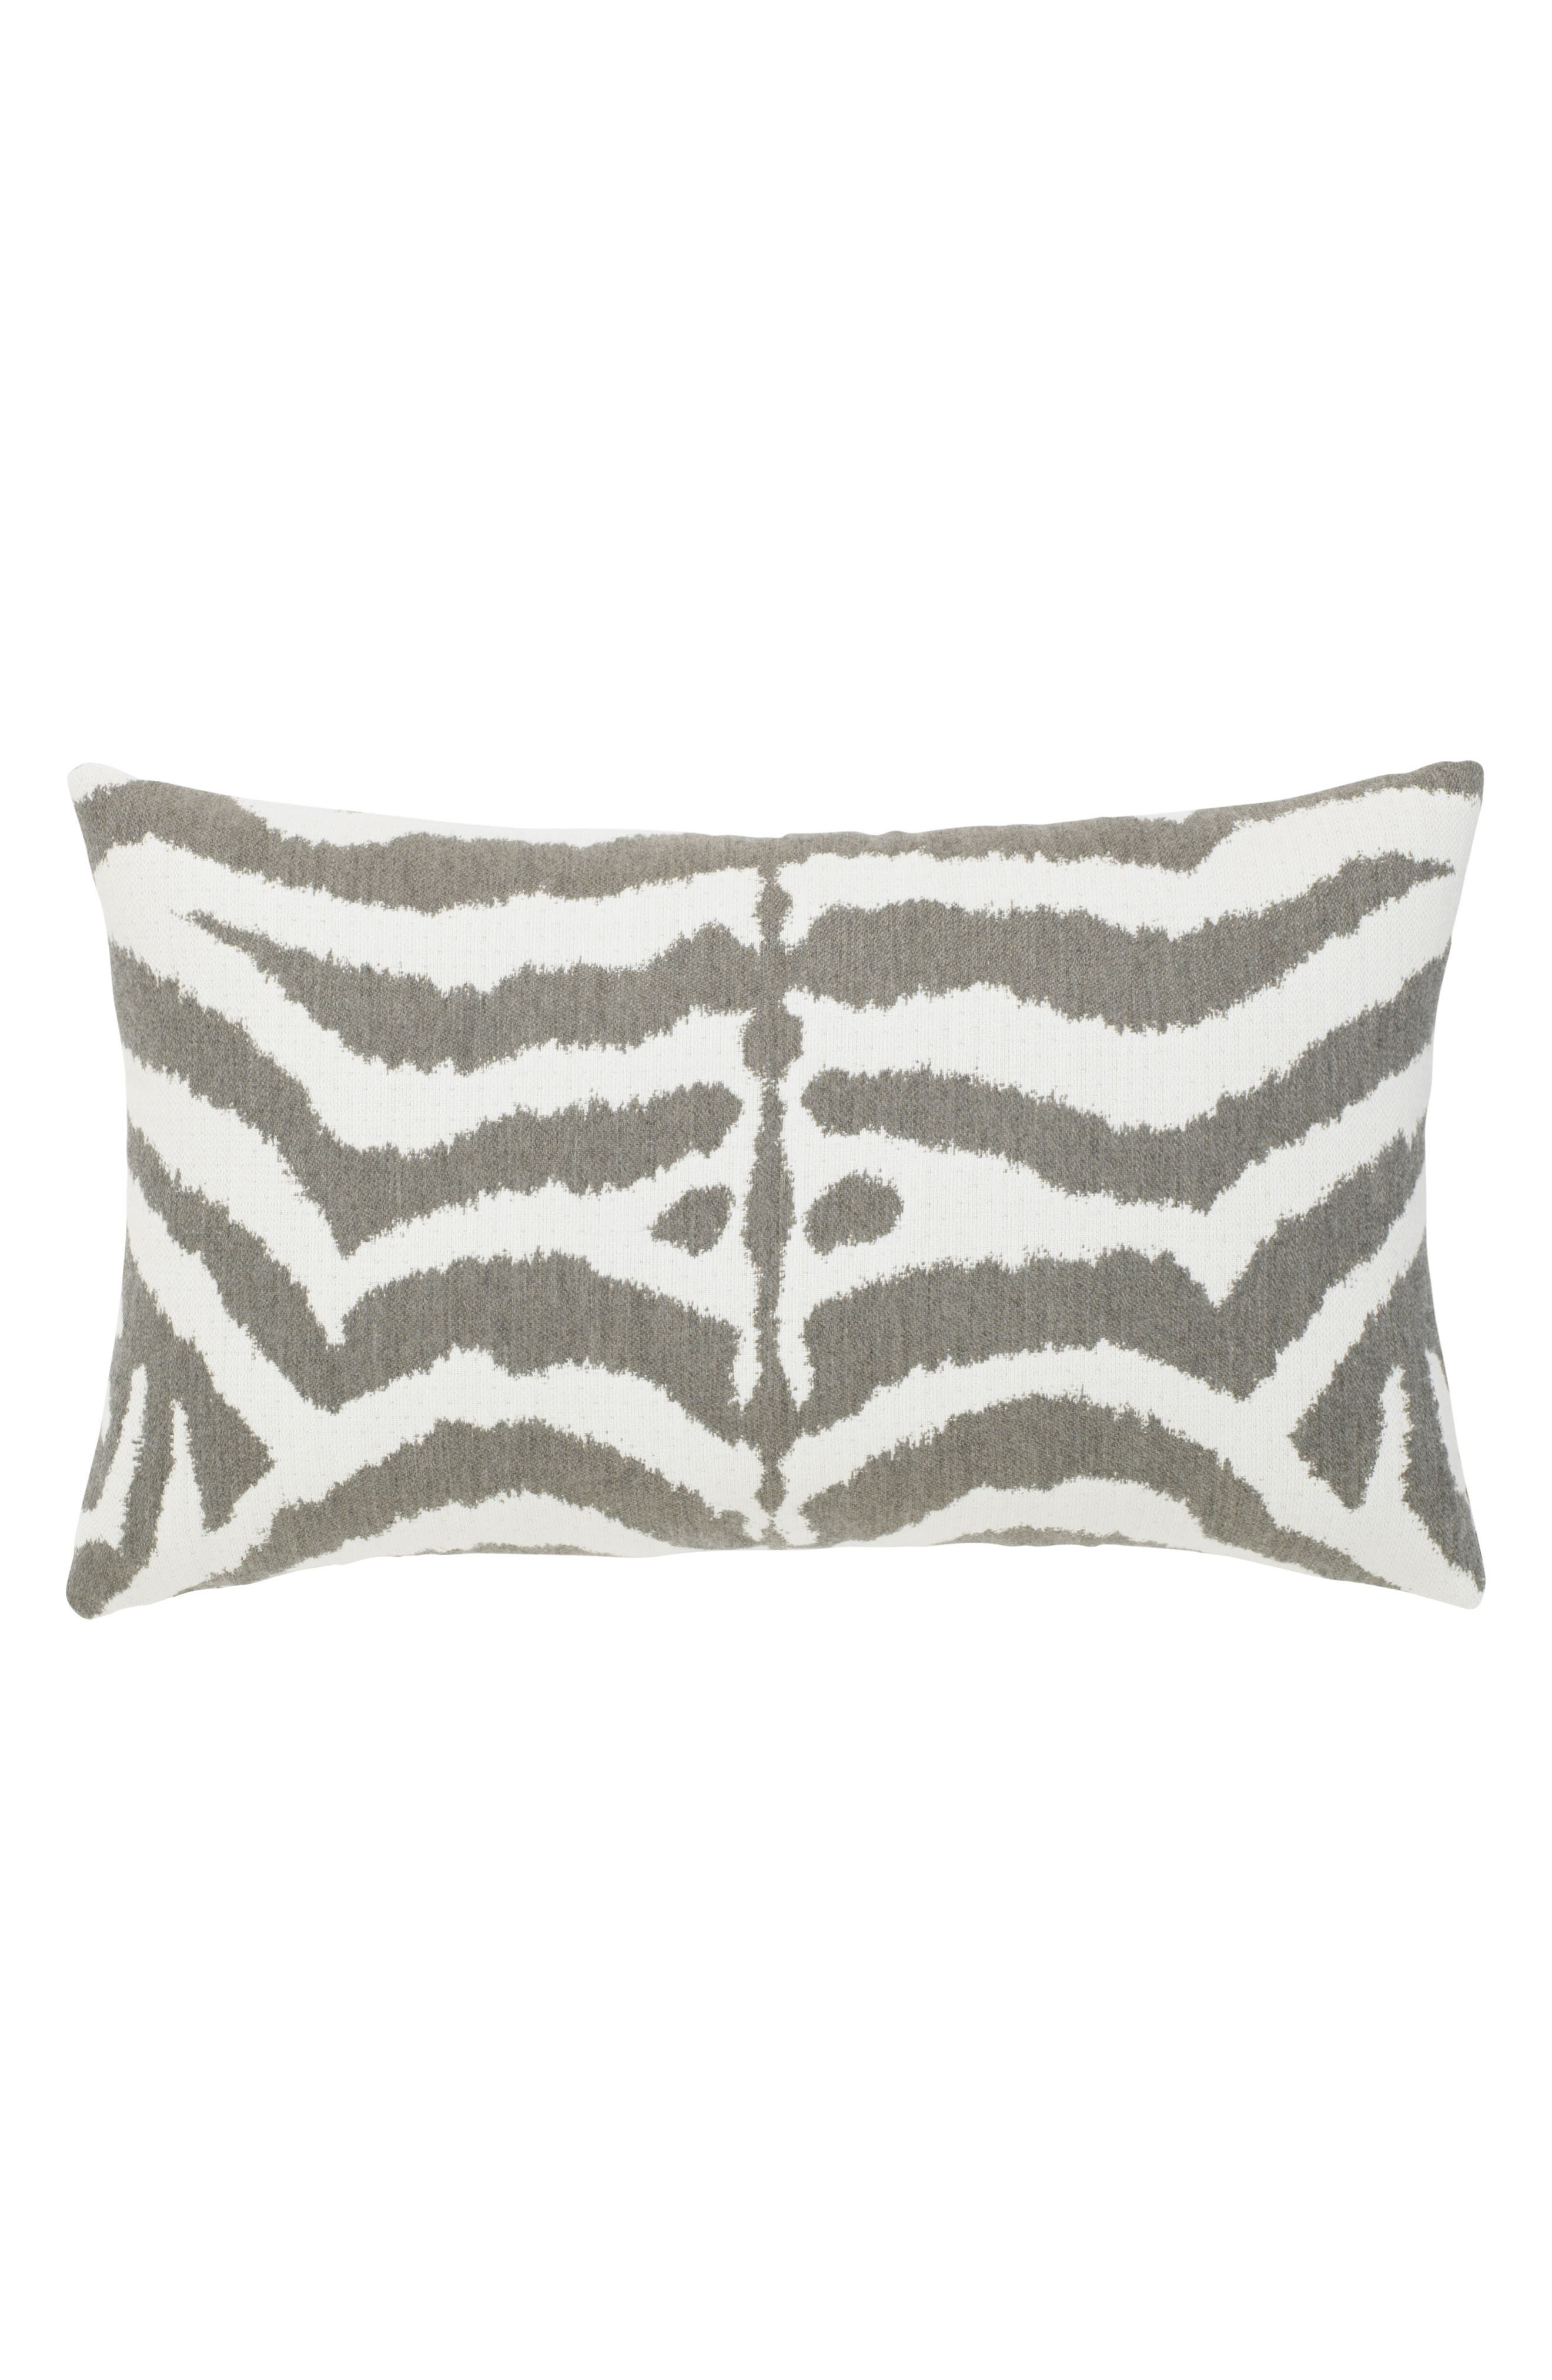 Alternate Image 1 Selected - Elaine Smith Zebra Gray Indoor/Outdoor Accent Pillow